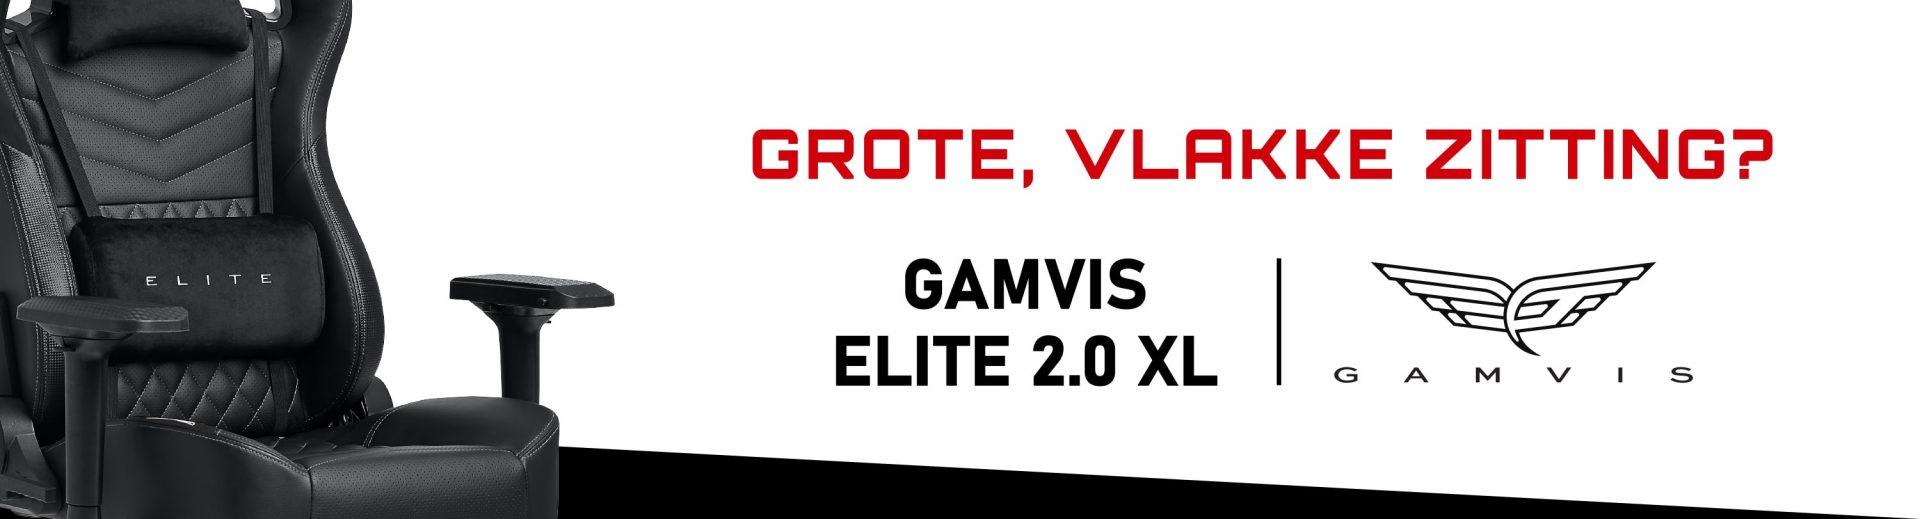 LARGE FLAT SEAT Elite NL-min